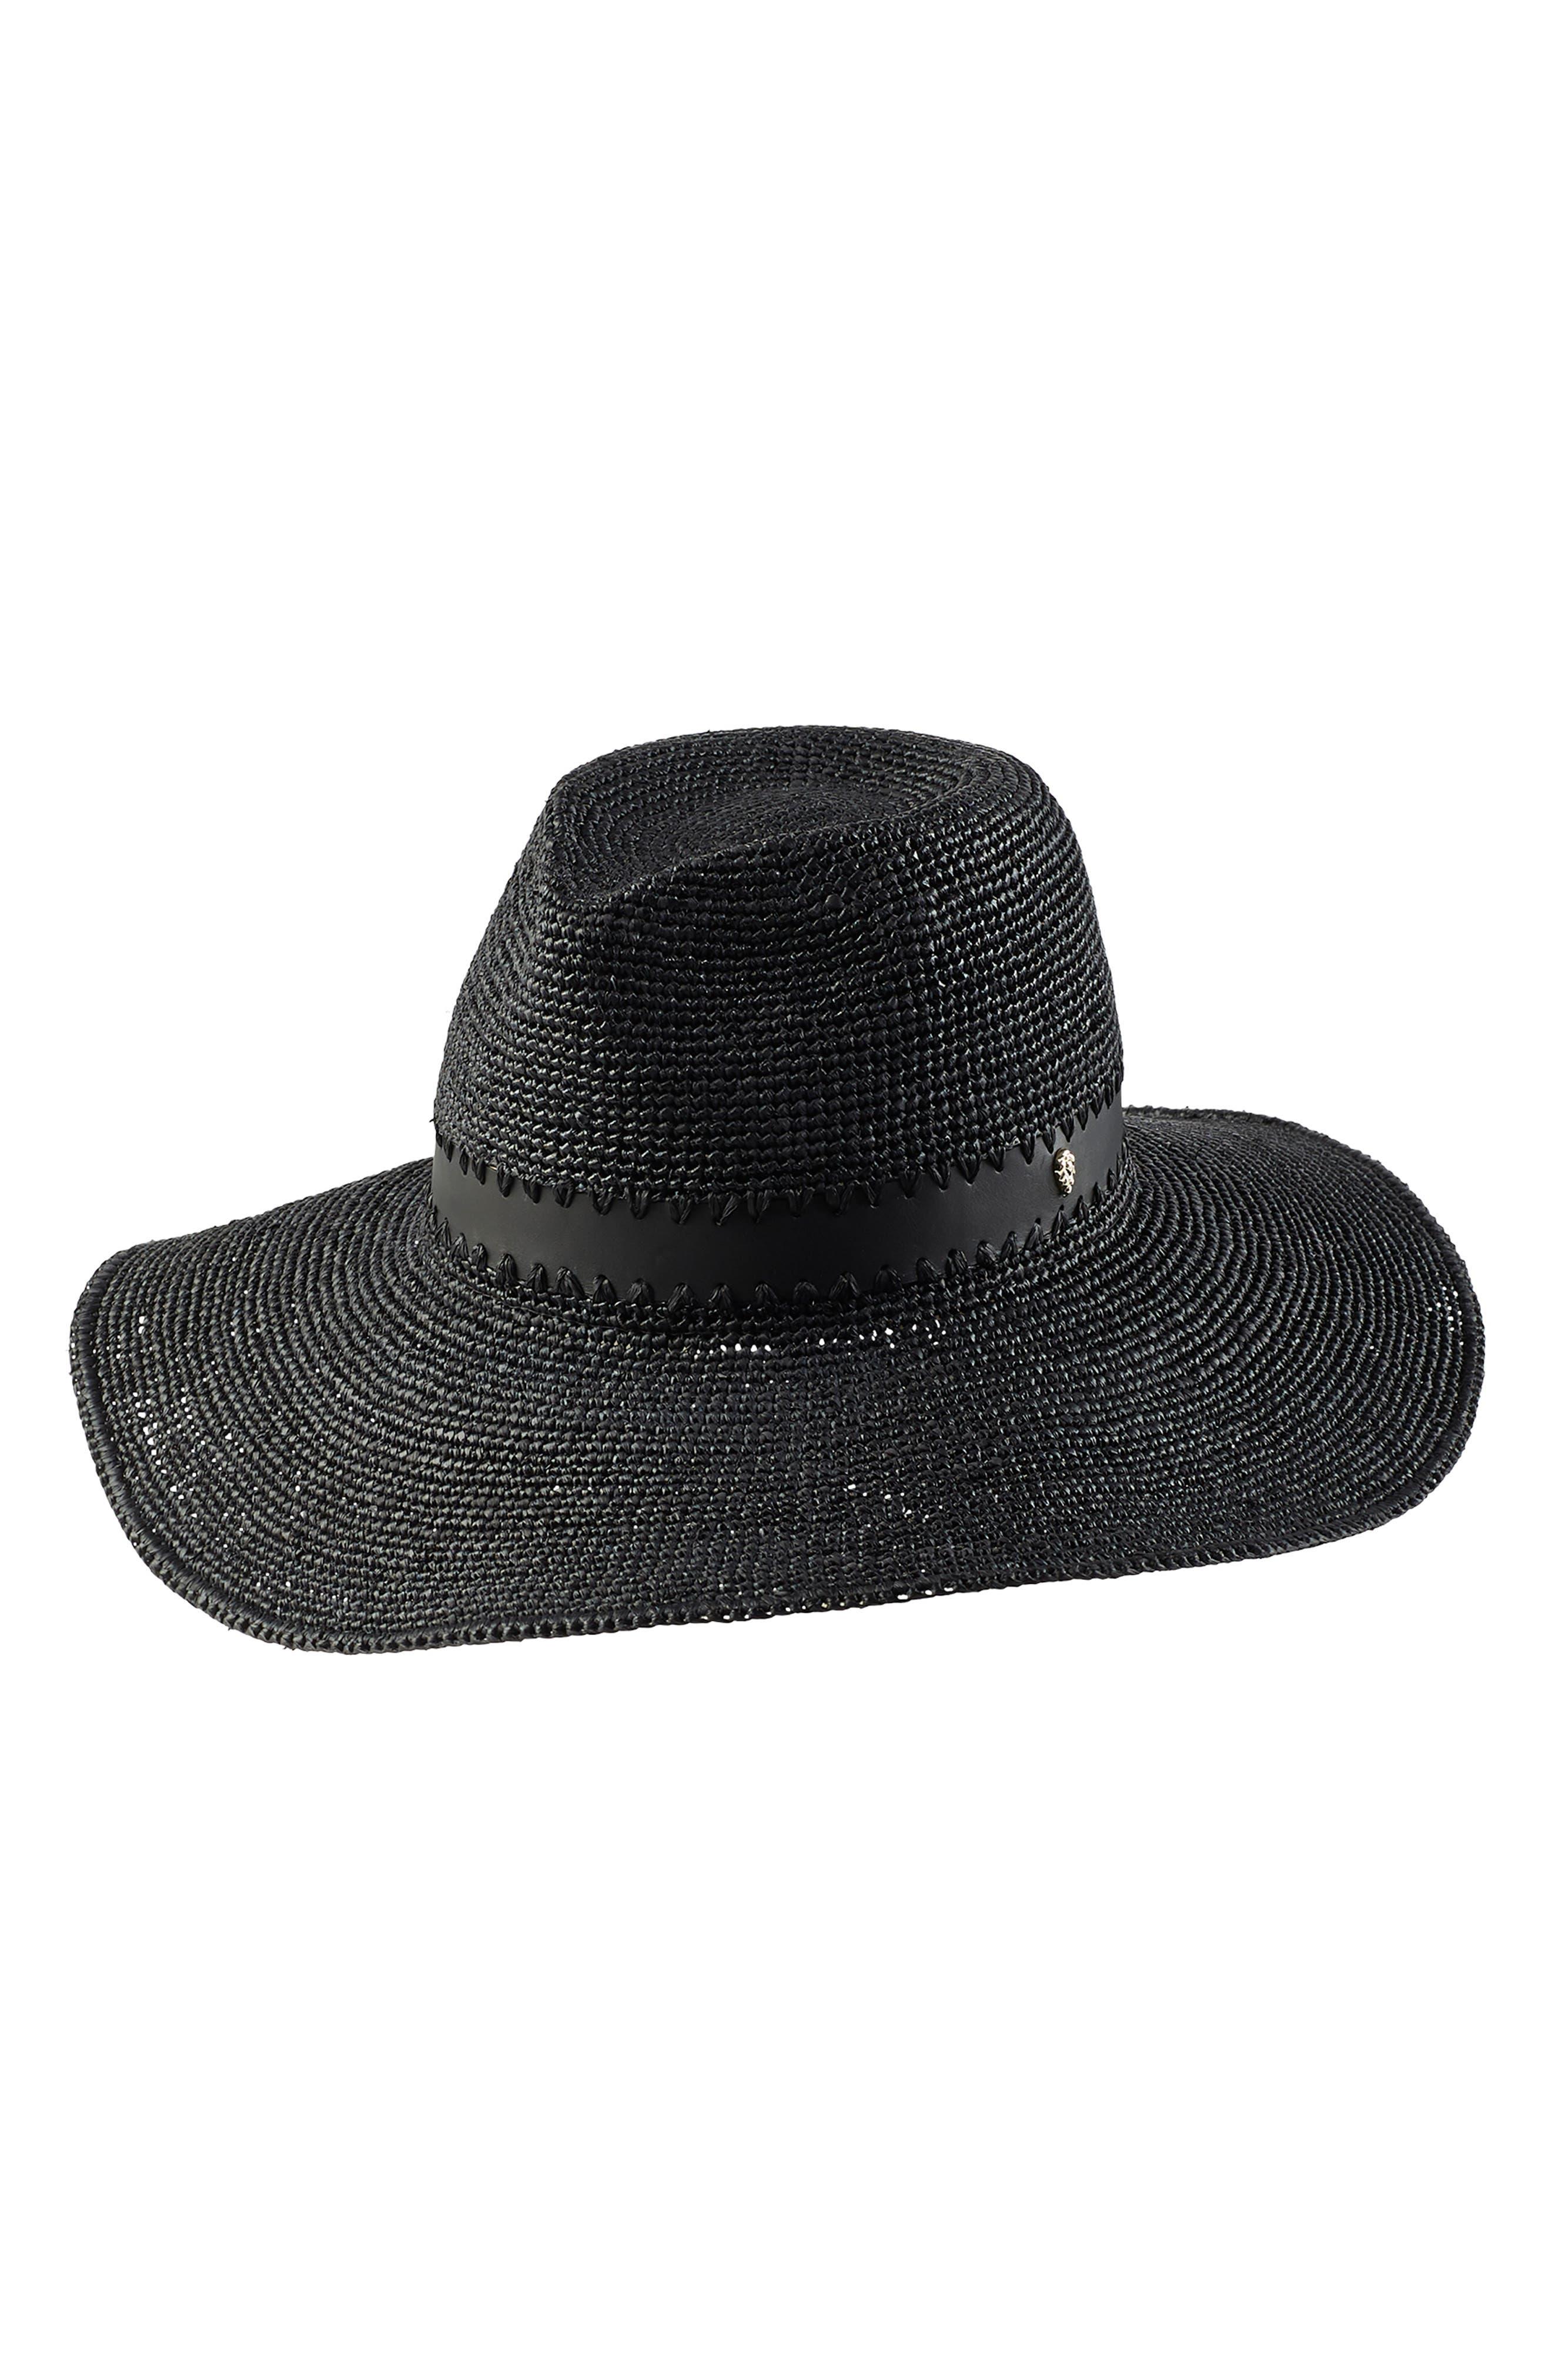 2f8b5a93203ba Women s Black Fedoras   Panama Hats